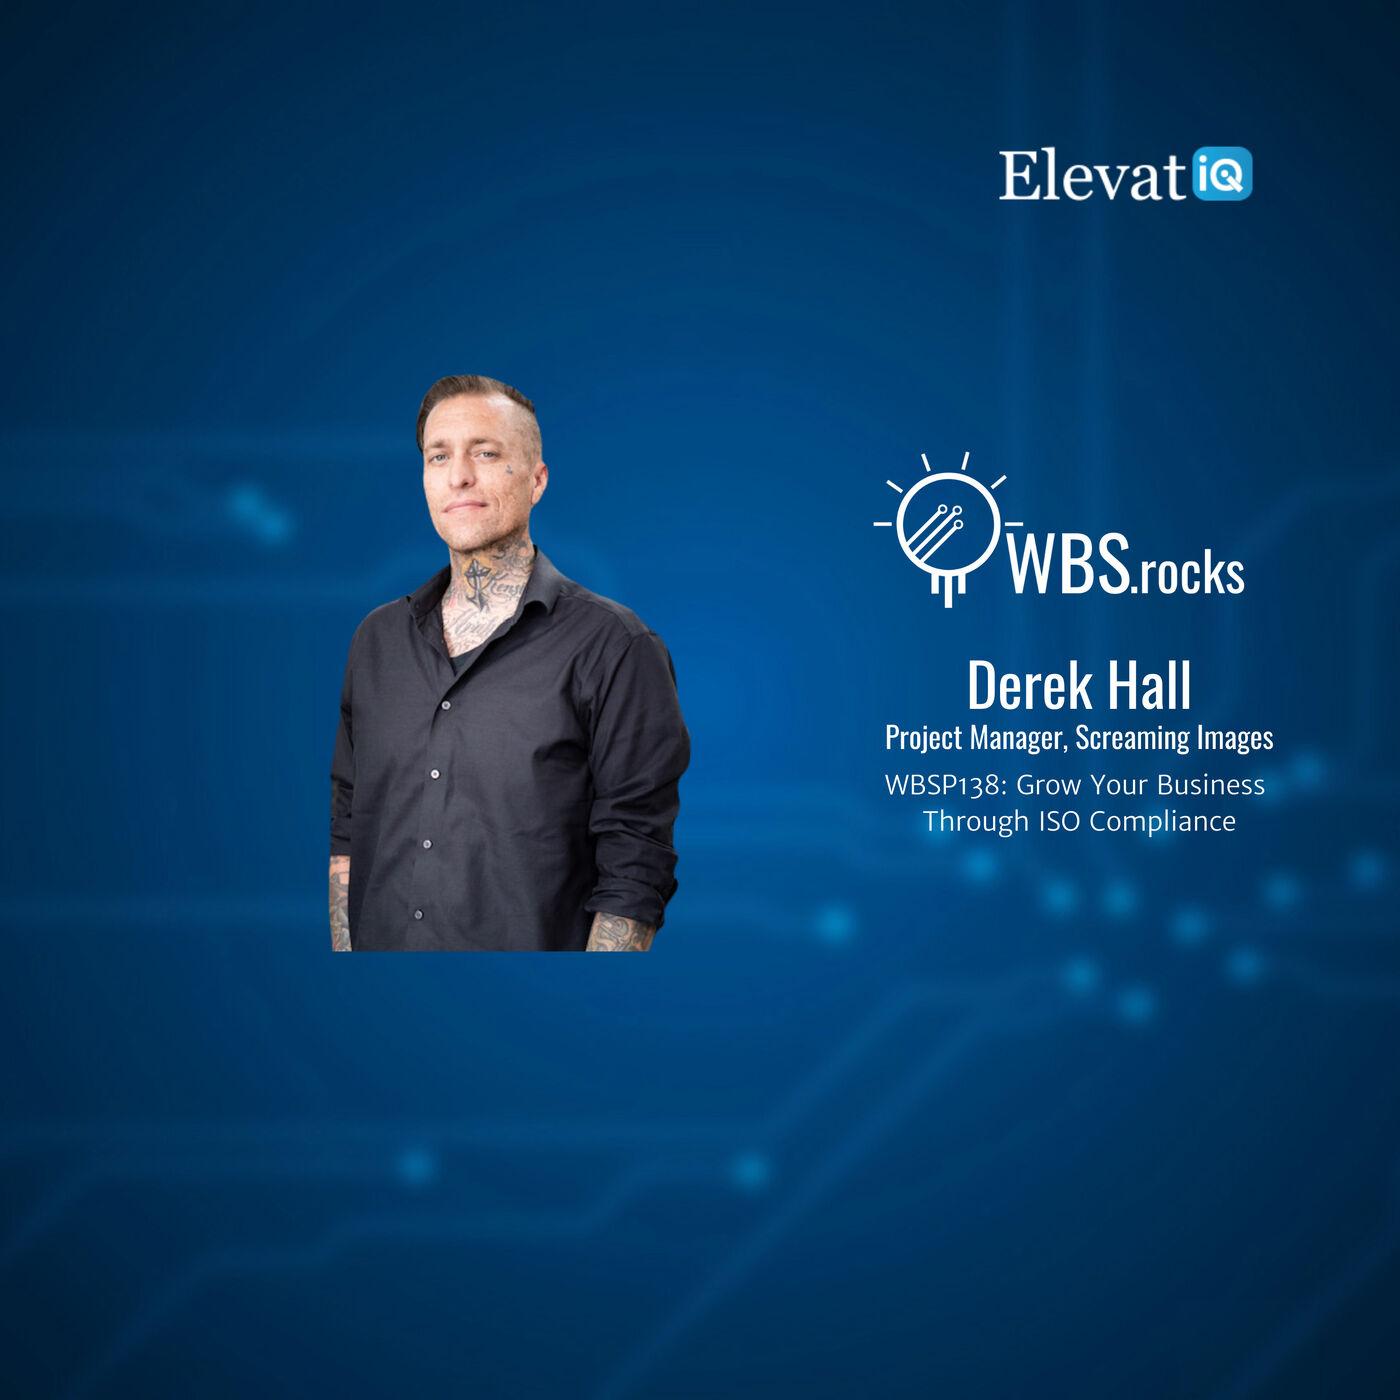 WBSP138: Grow Your Business Through ISO Compliance w/ Derek Hall